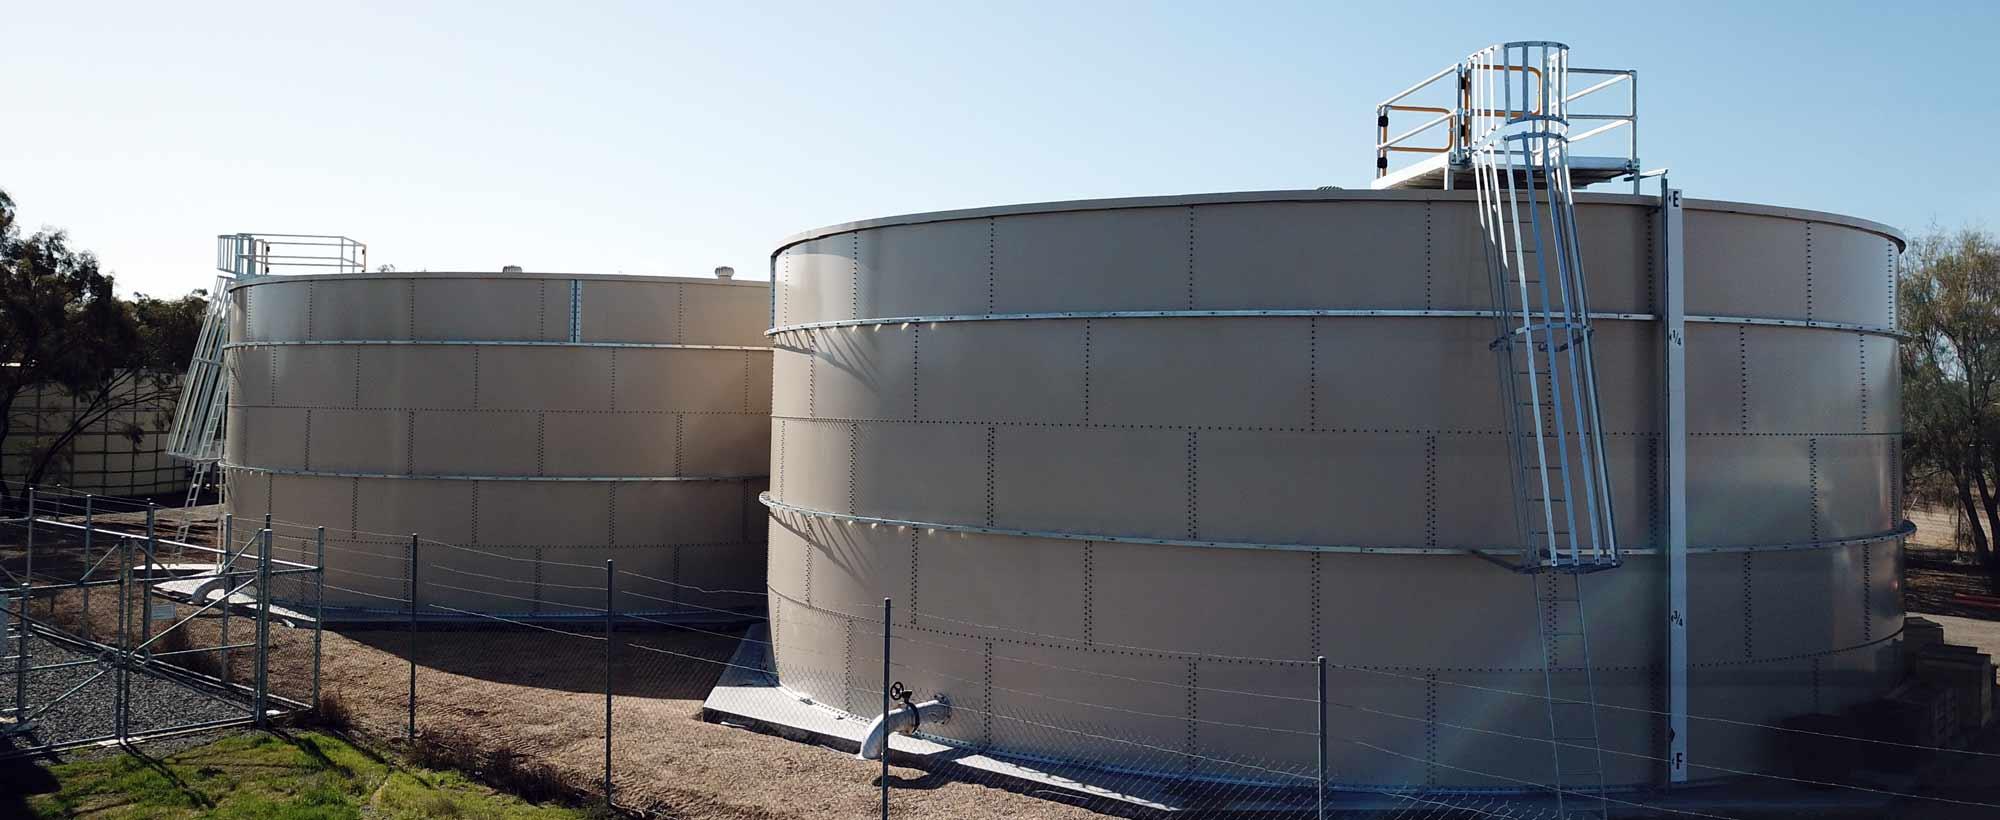 Hopetoun water treatment plant